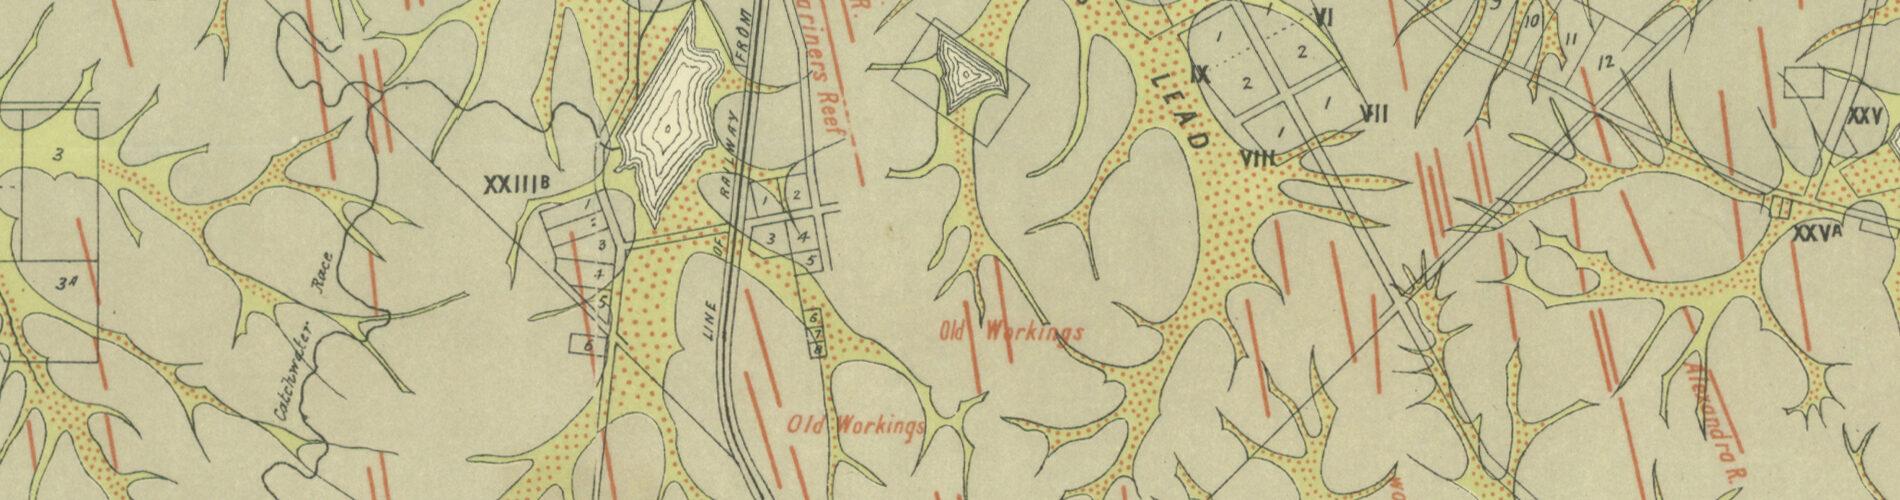 Victorian goldfields map